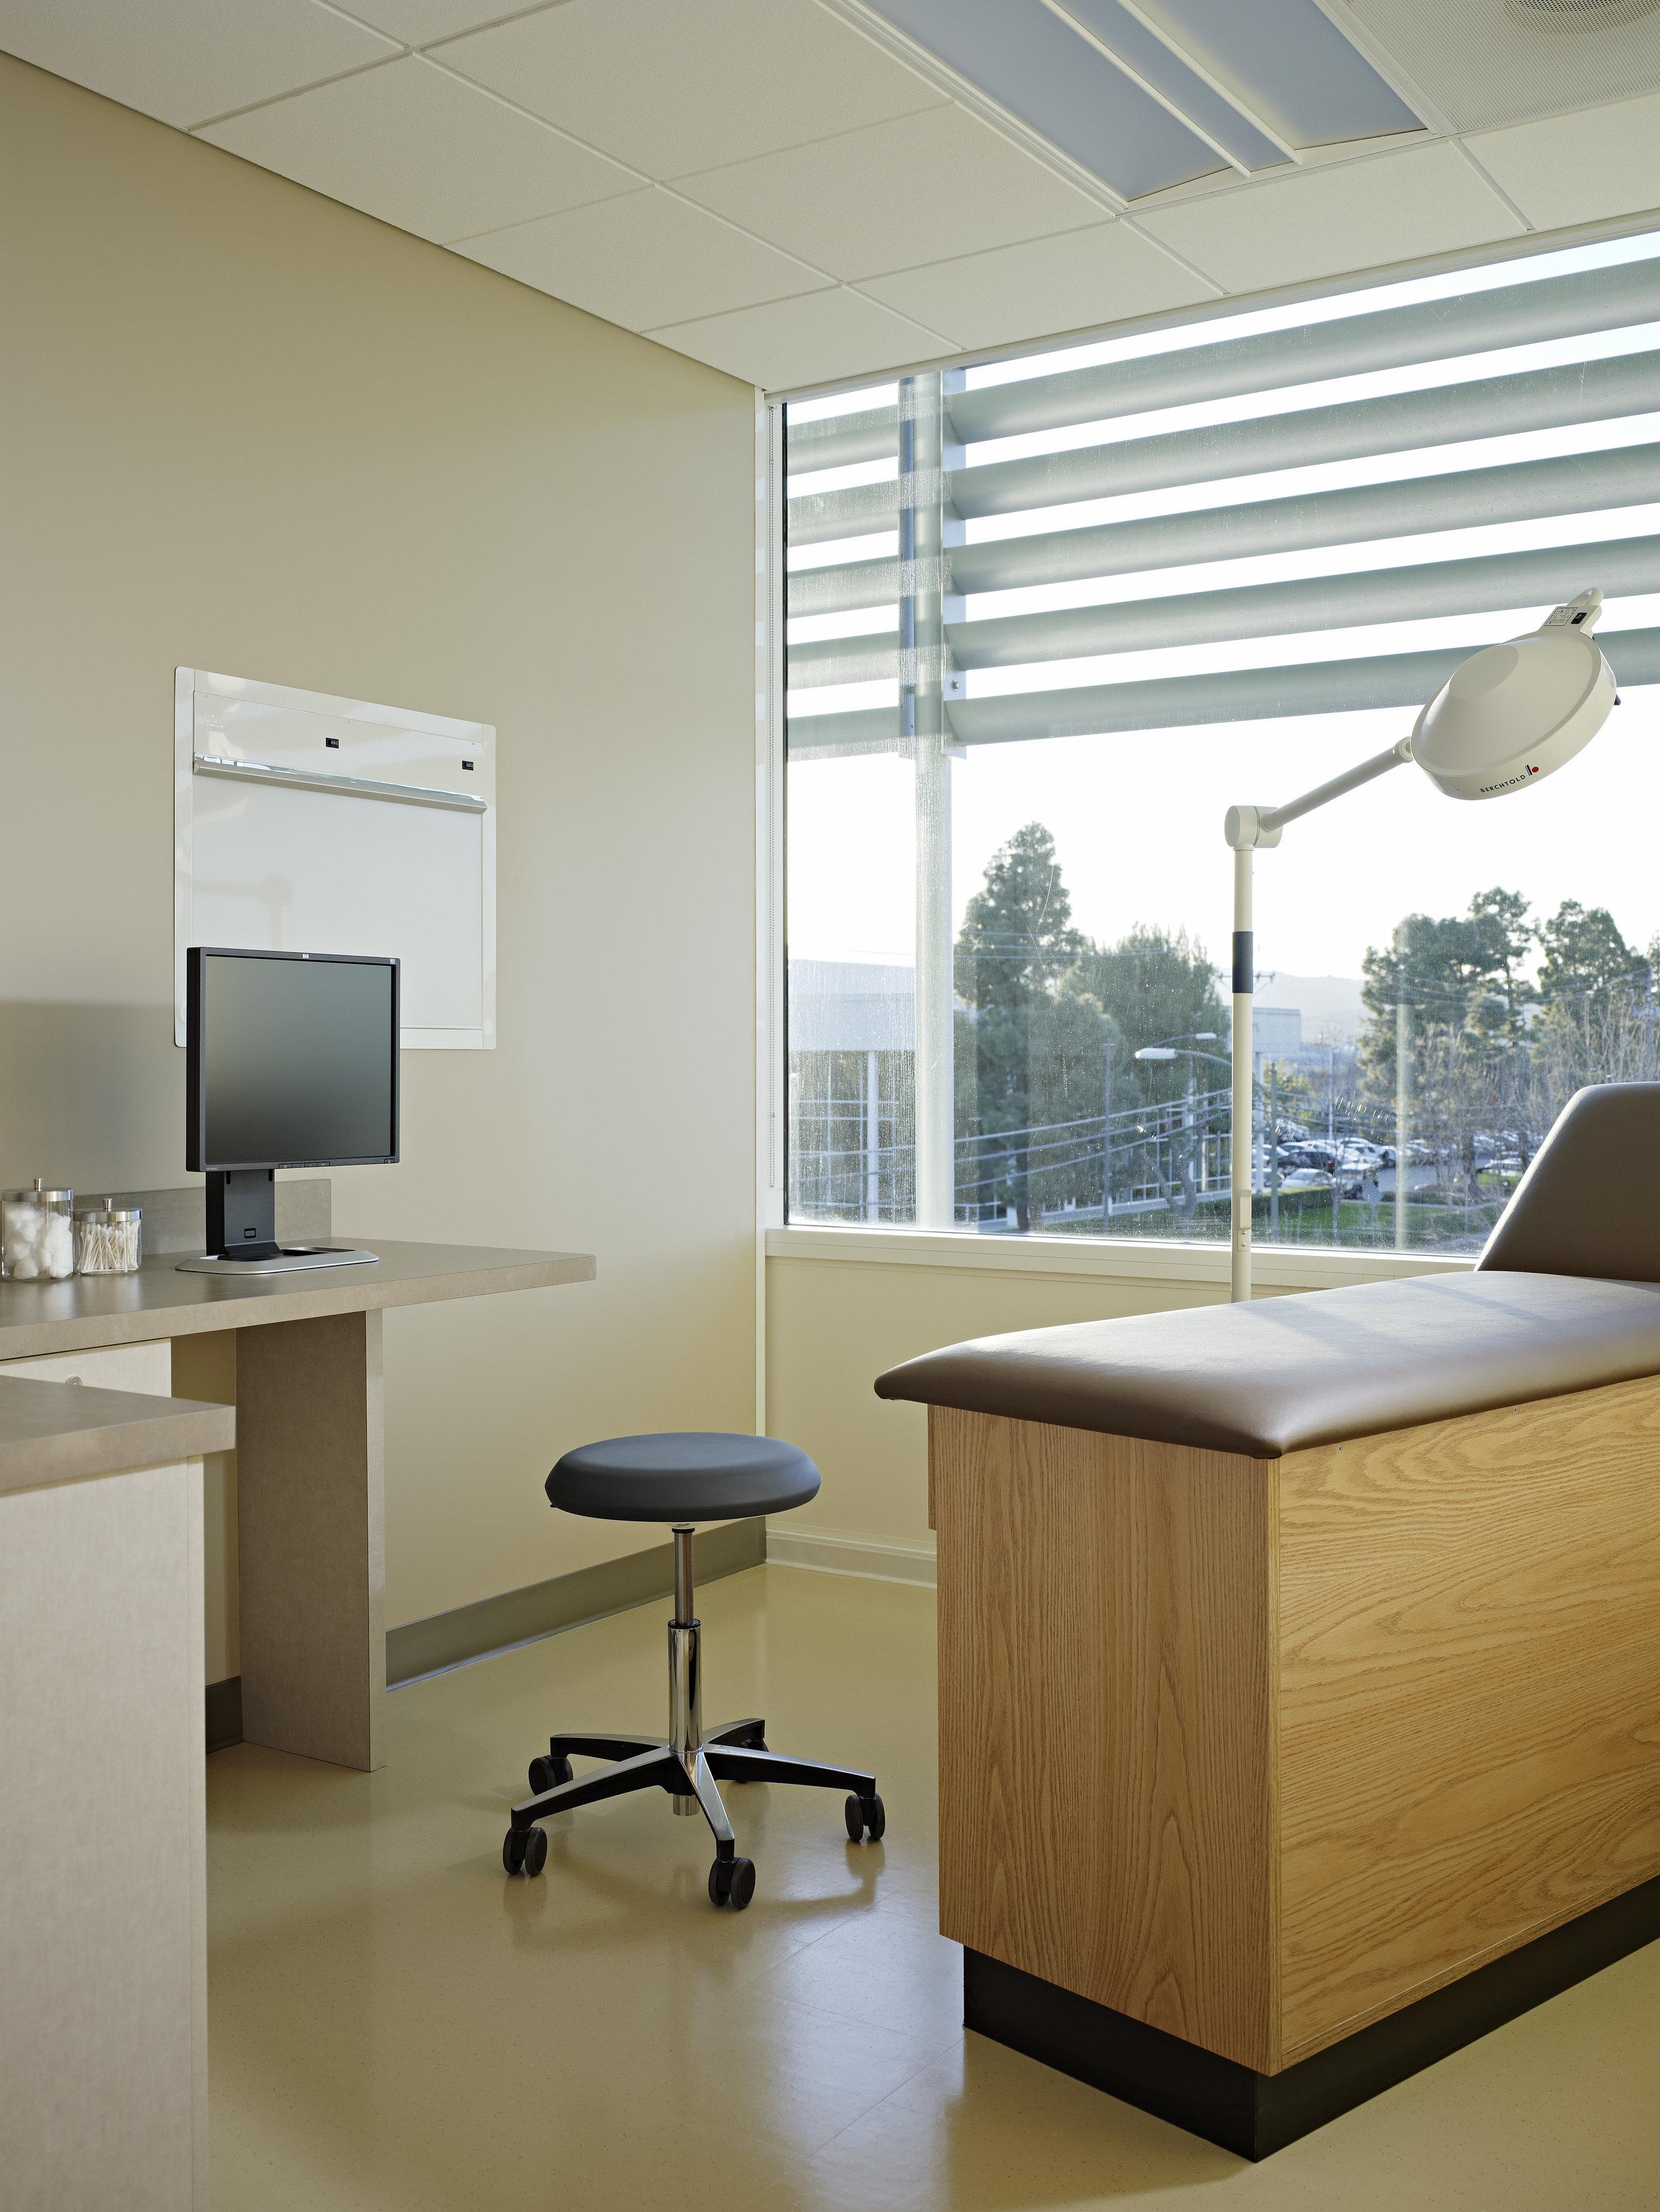 stanford-hospital-outpatient-ctr-int09.jpg